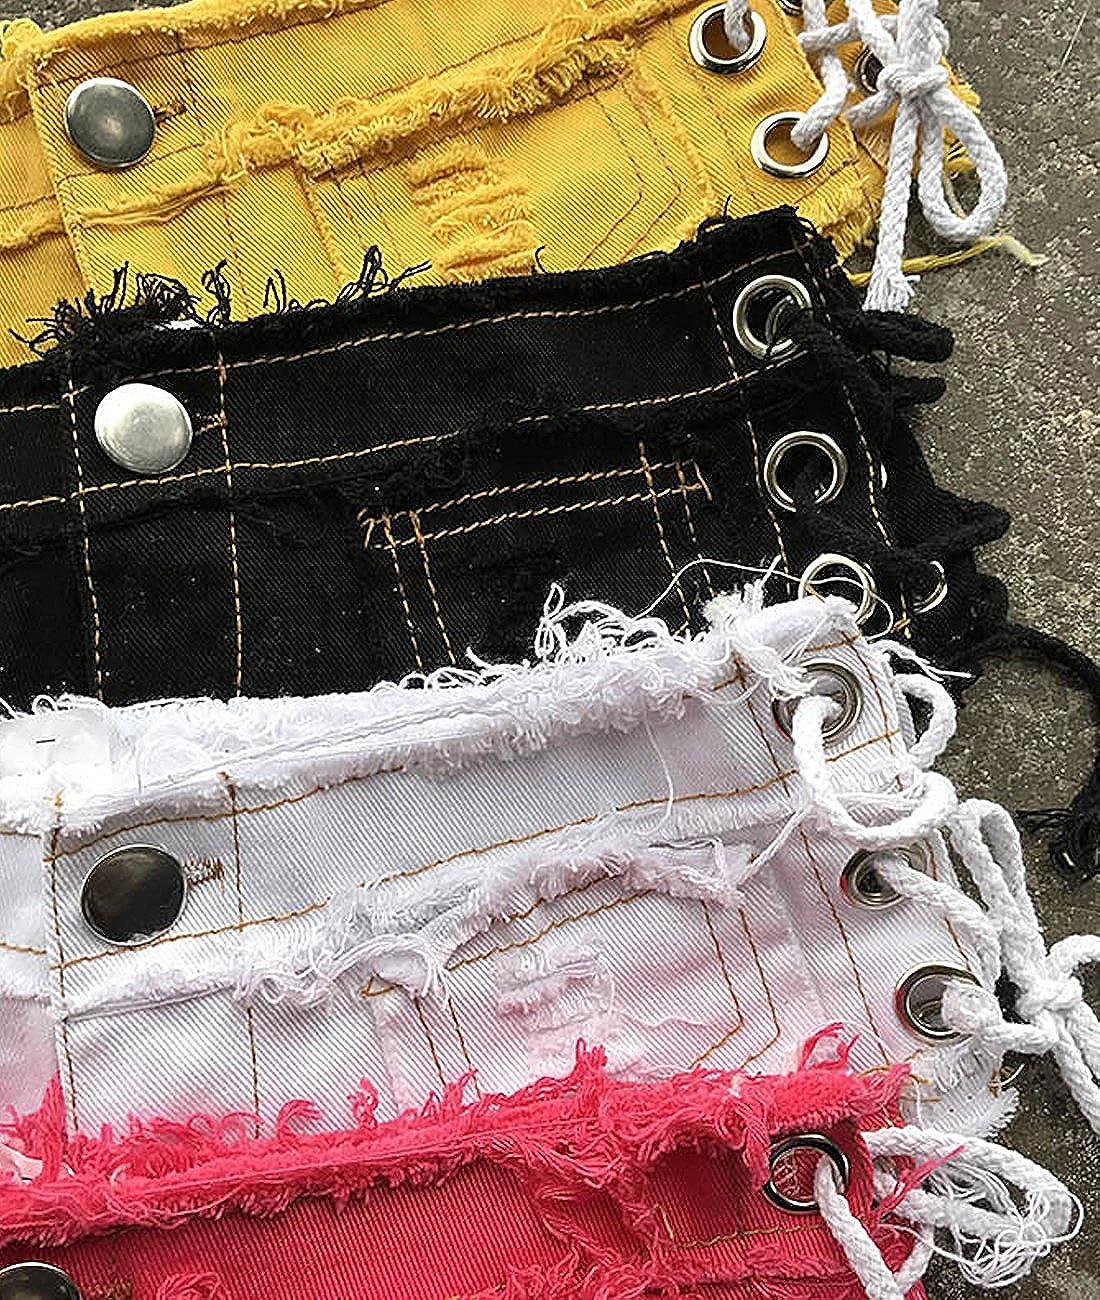 HAODIAN Womens Lace Up Ripped Cheeky Mini Denim Short